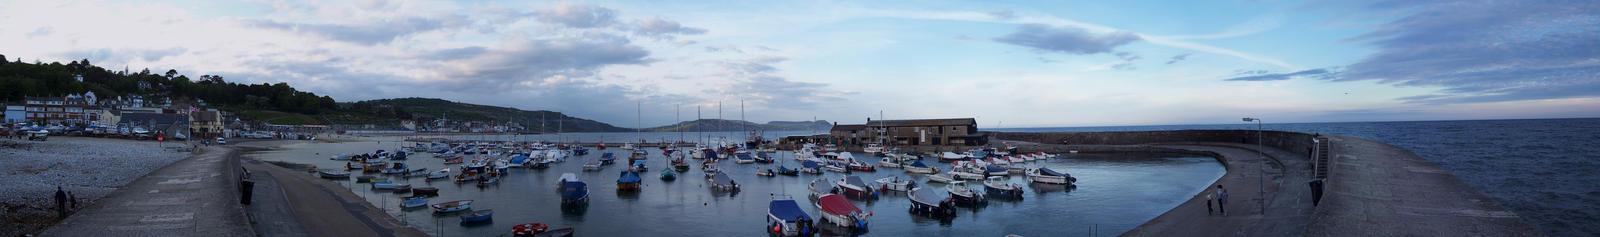 A harbour in Lyme Regis by ImageMagic